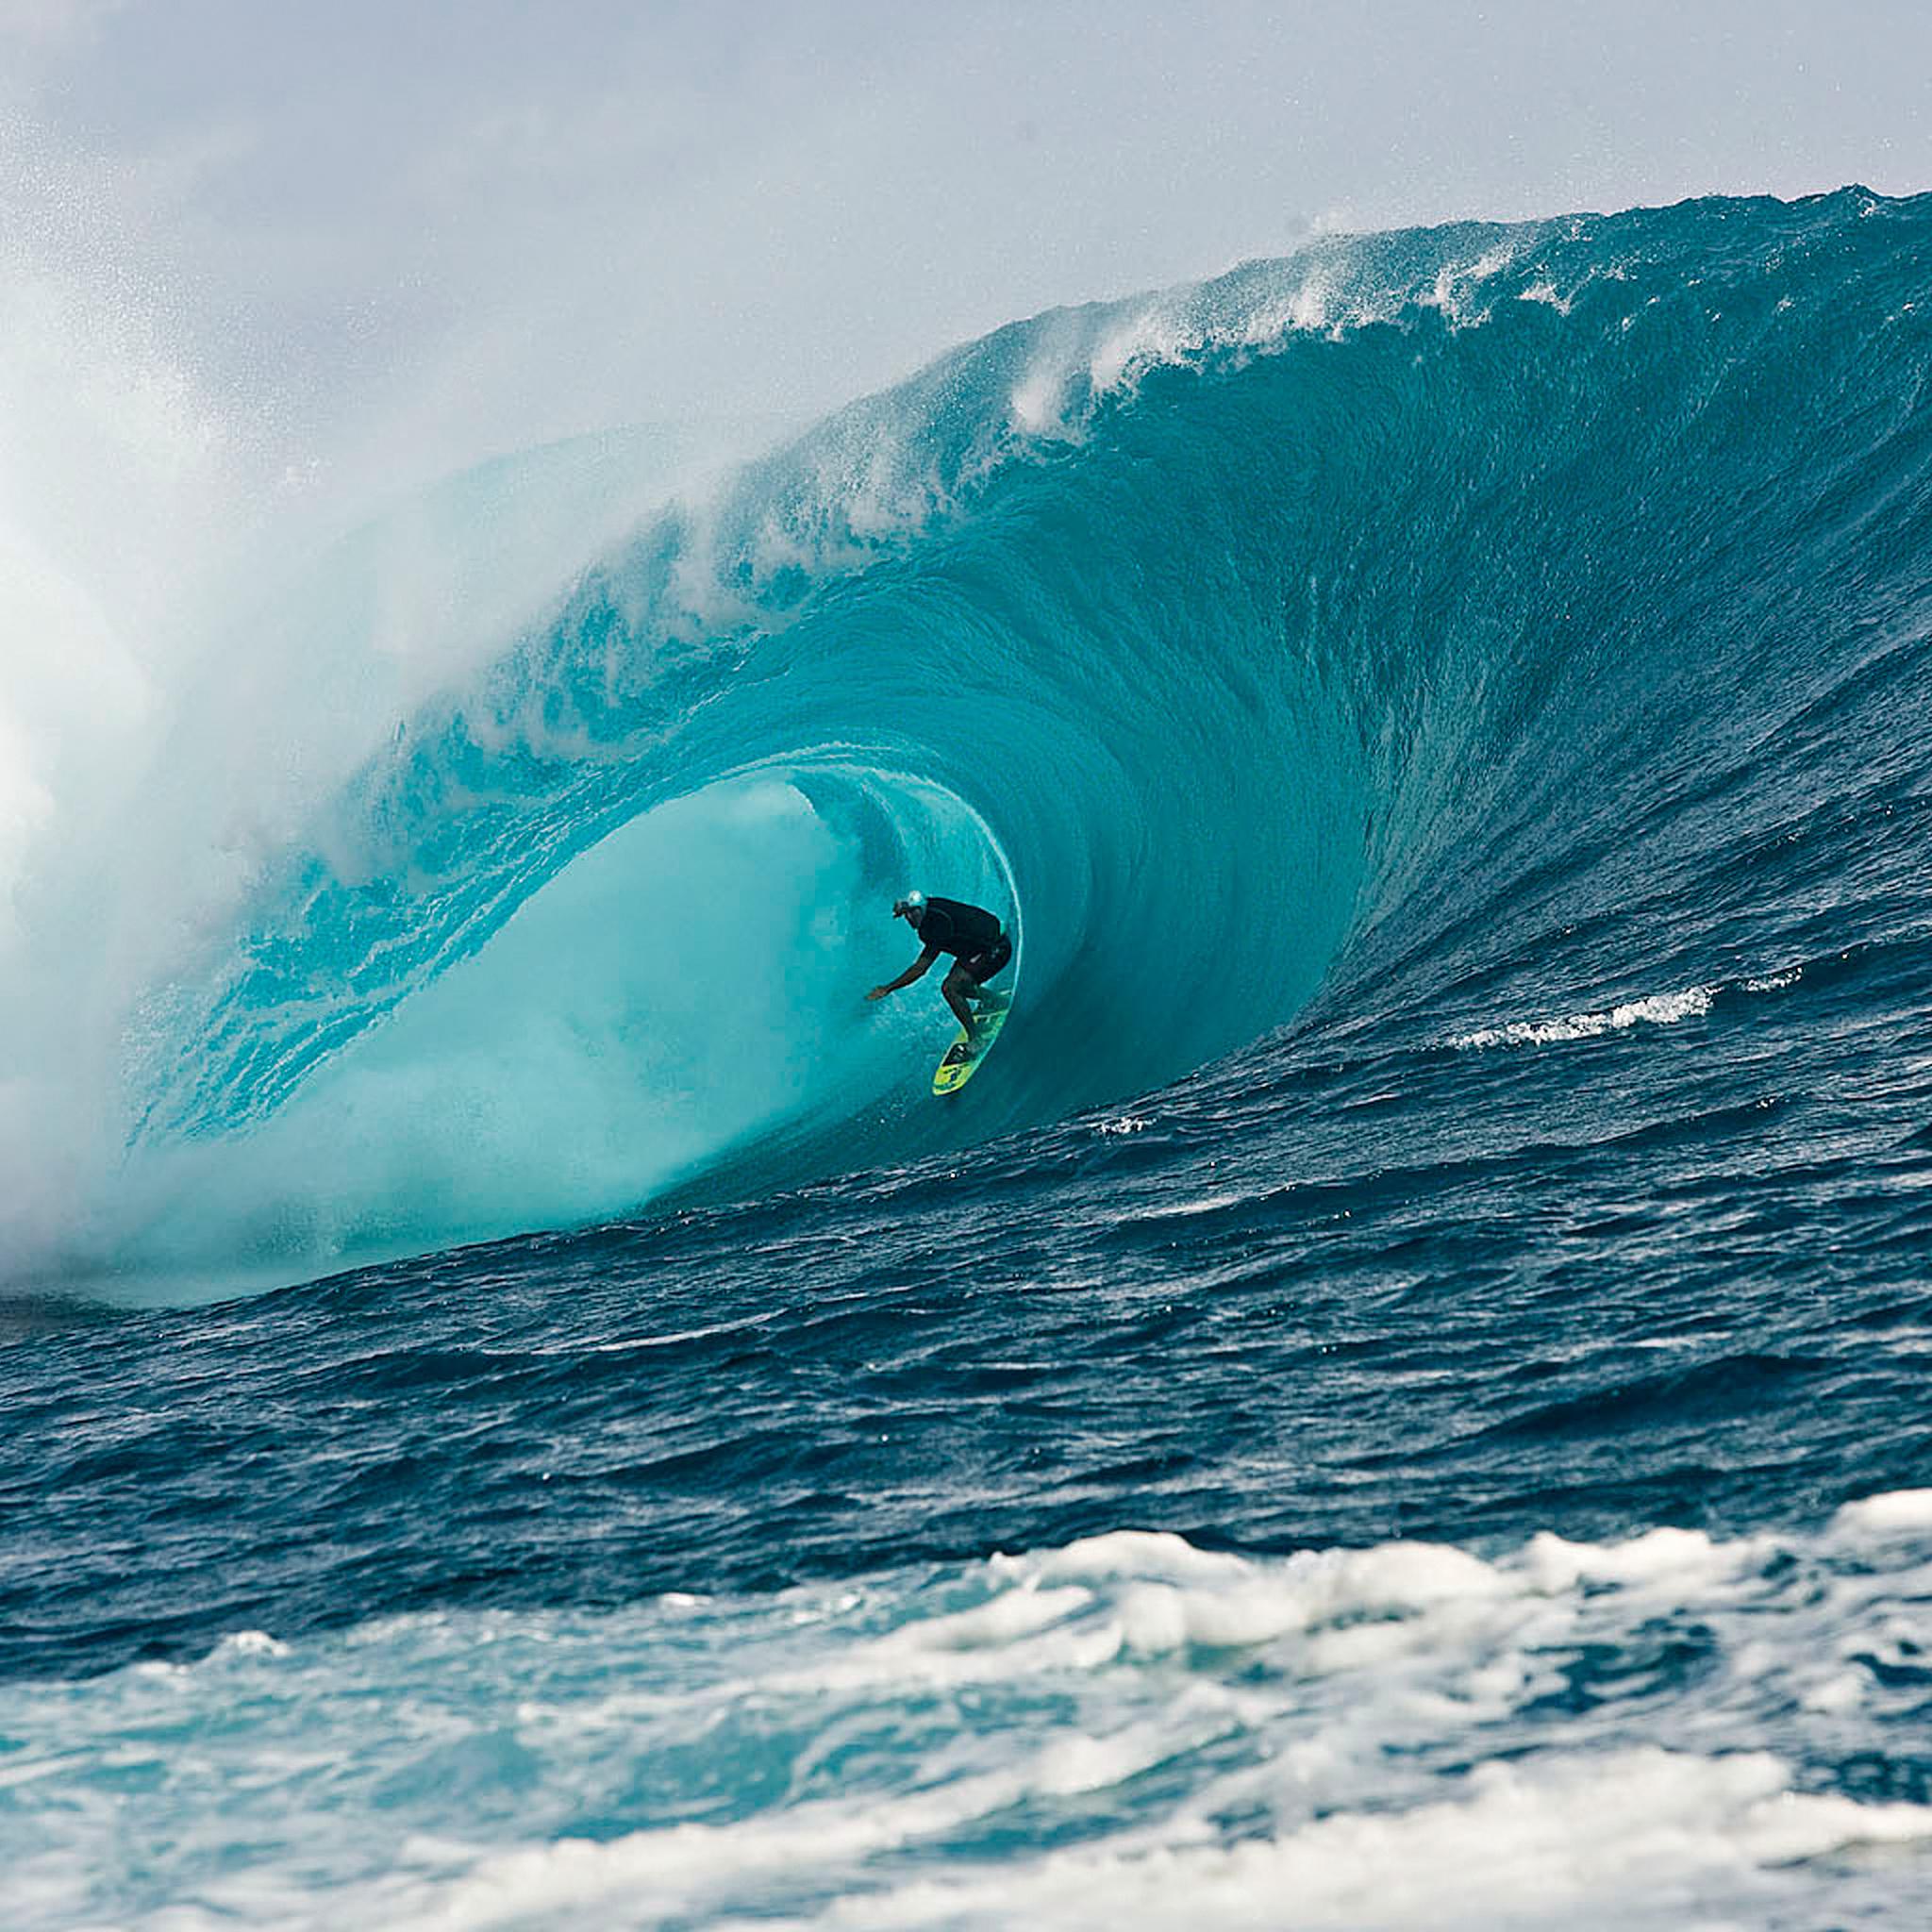 Wave Surf Ipad Retina Wallpaper For Iphone X 8 7 6